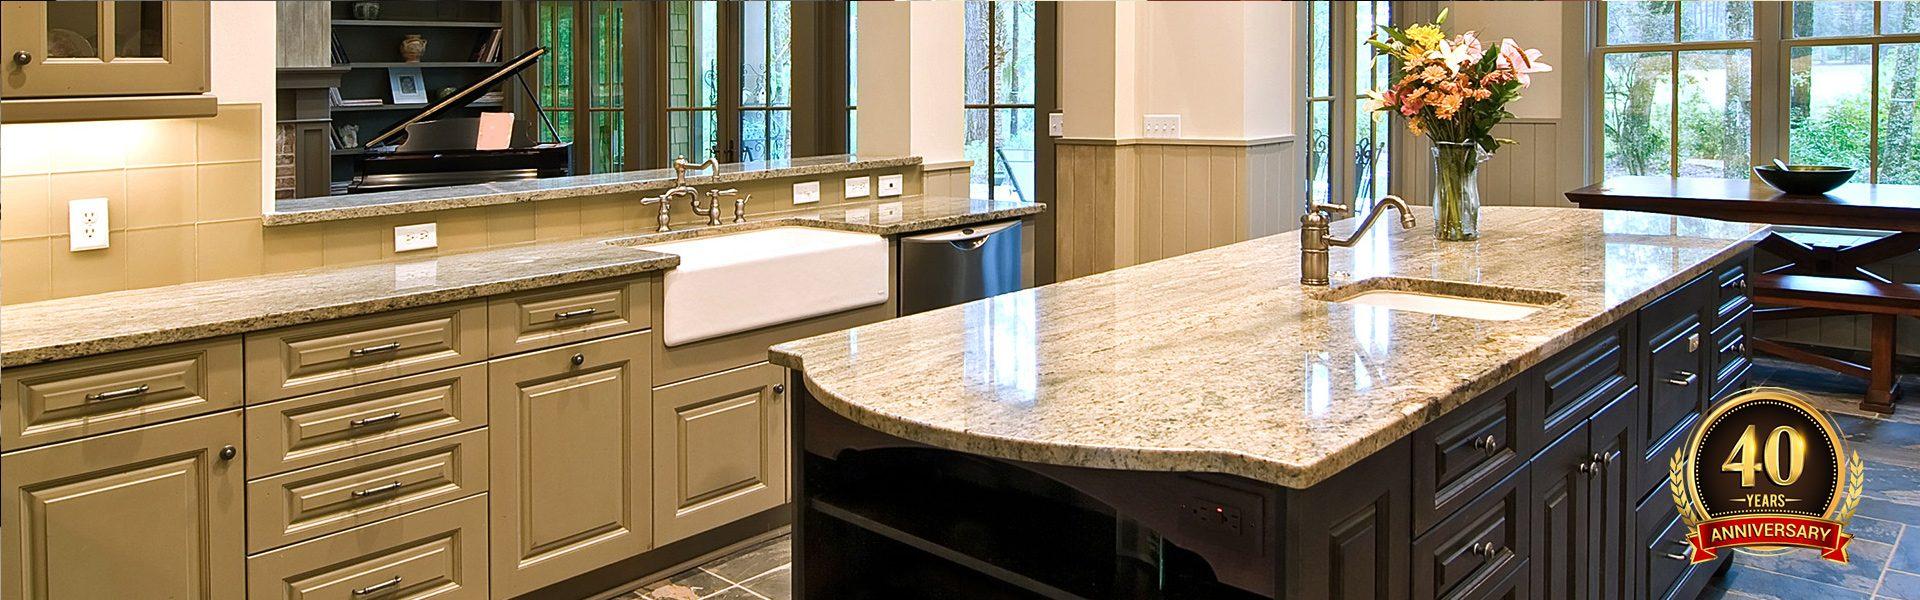 Custom Countertop Design, Fabrication & Install - European Wholesale ...